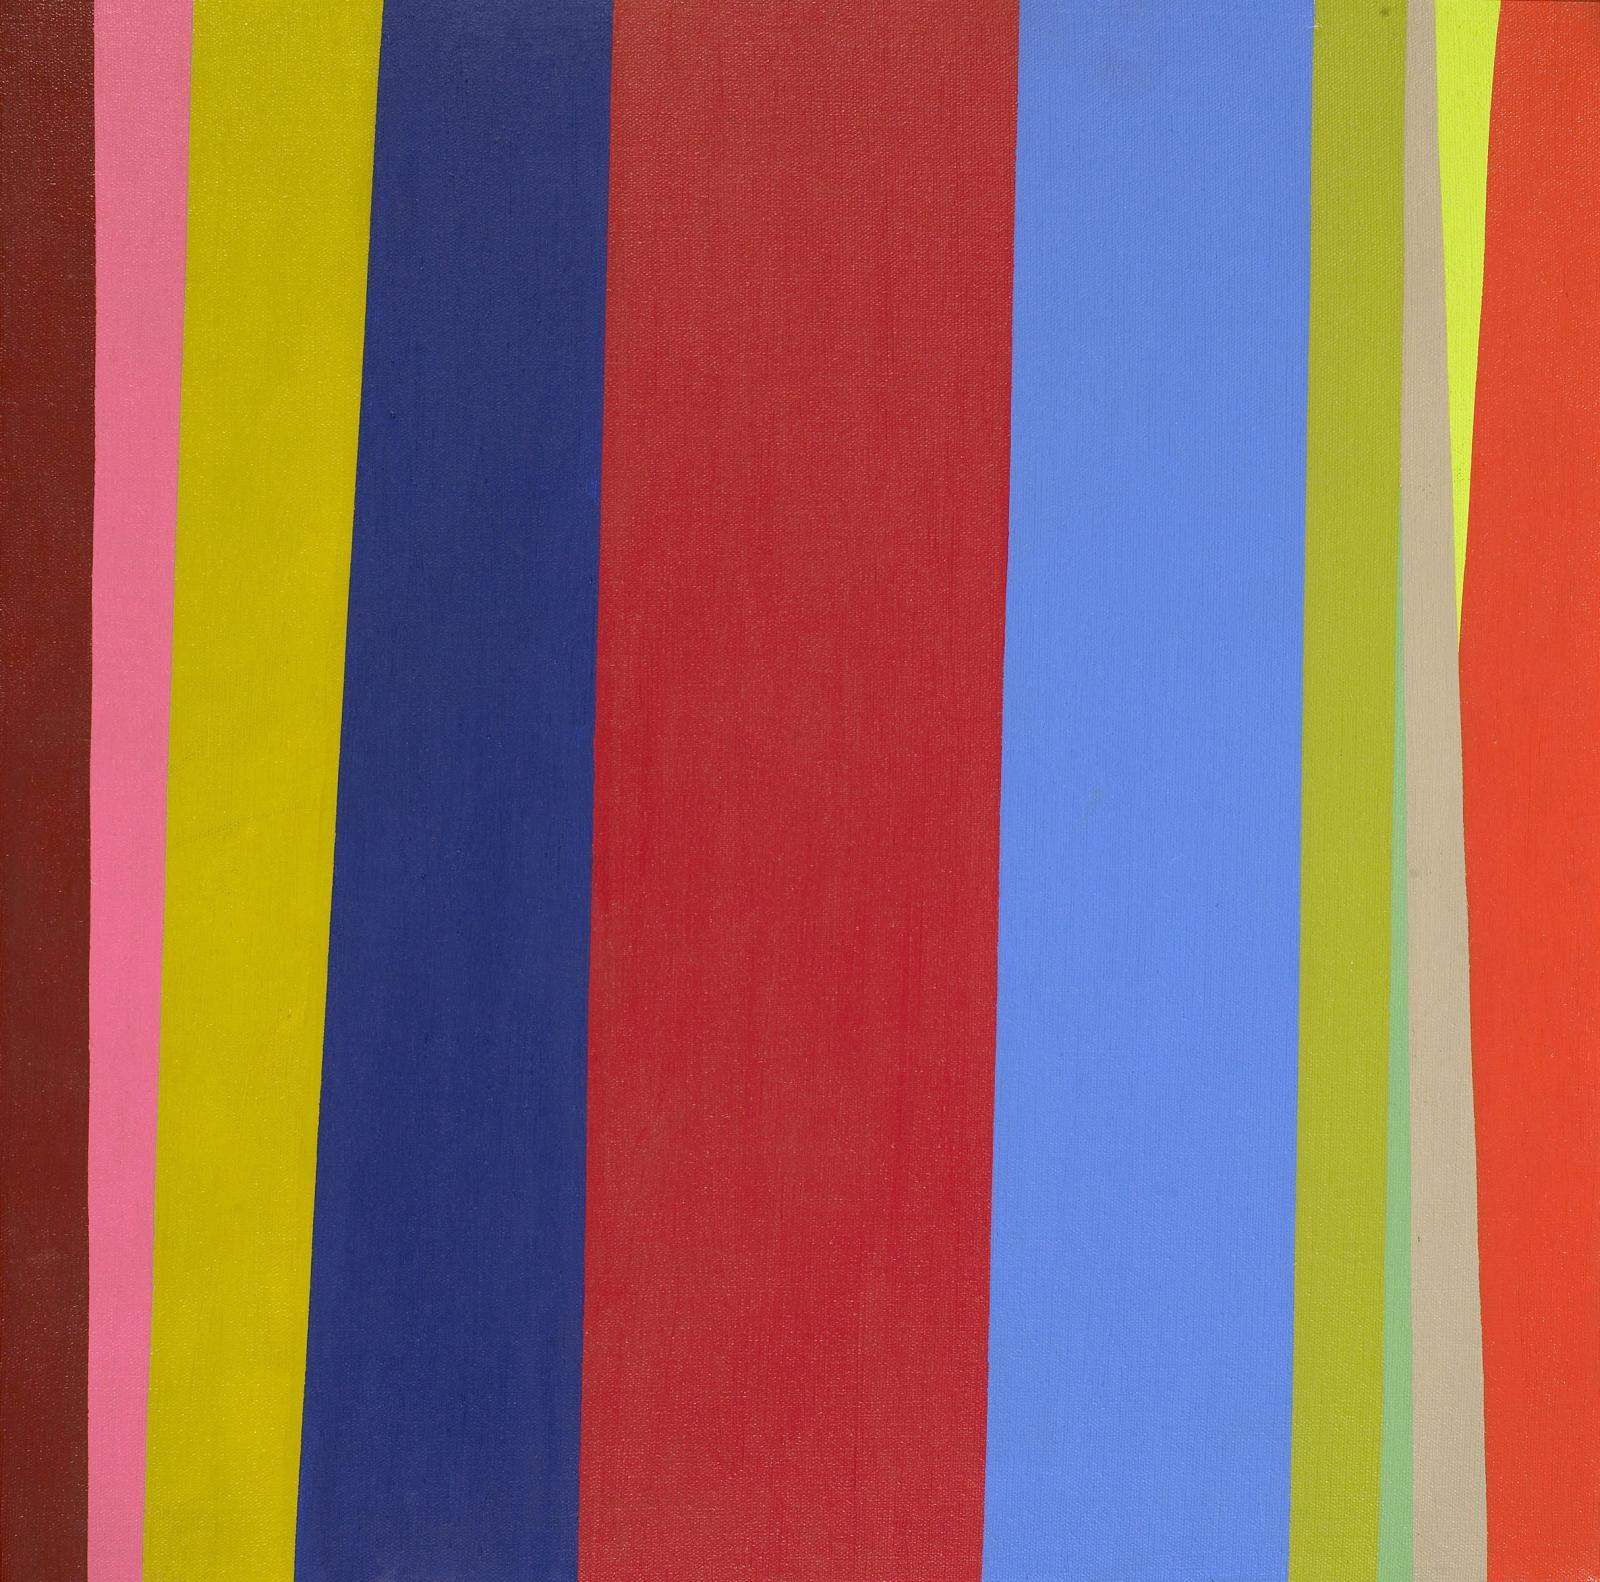 Jay Rosenblum, Gradus Ad Parnassum, 1970